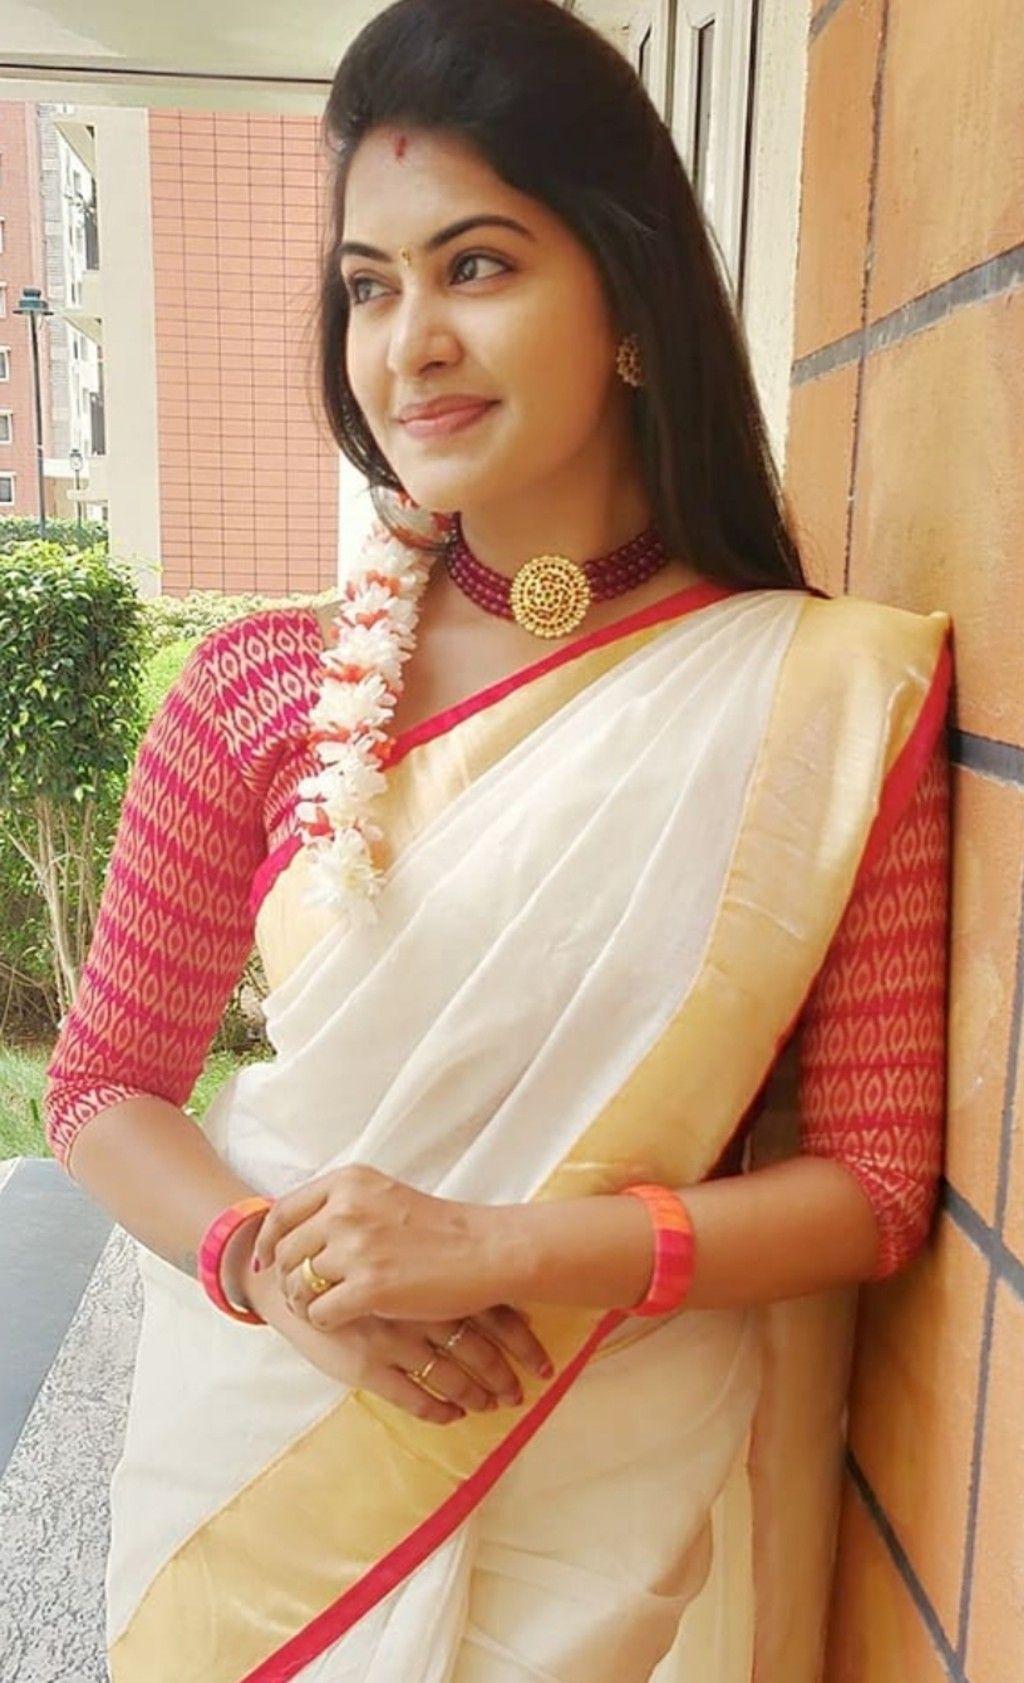 Pin by Actress Gallery on Rachitha in 2020 | Saree photoshoot, Saree styles, Kerala saree